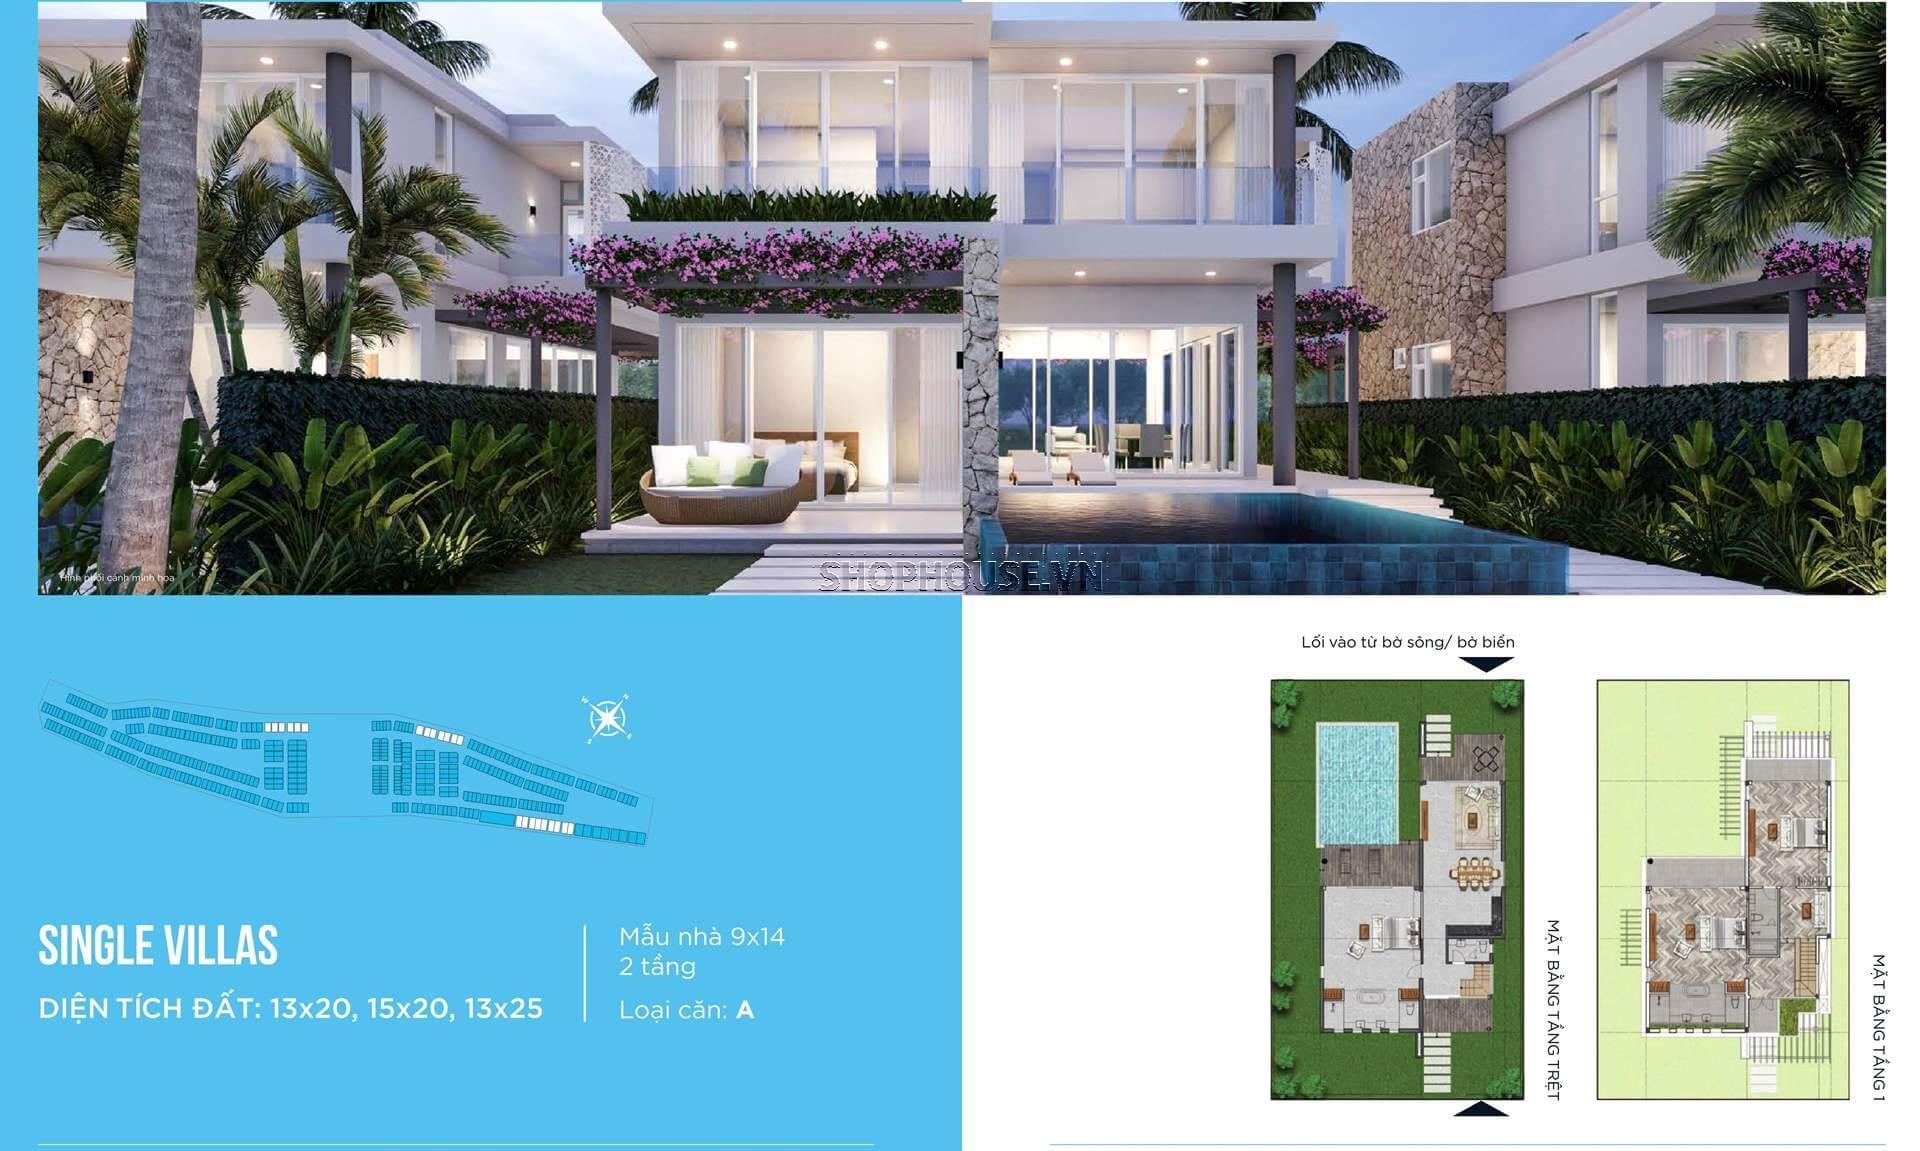 ban-ve-thiet-ke-biet-thu-don-lap-single-villas-Habana-Island-mau-A-13x20-13x25-15x20